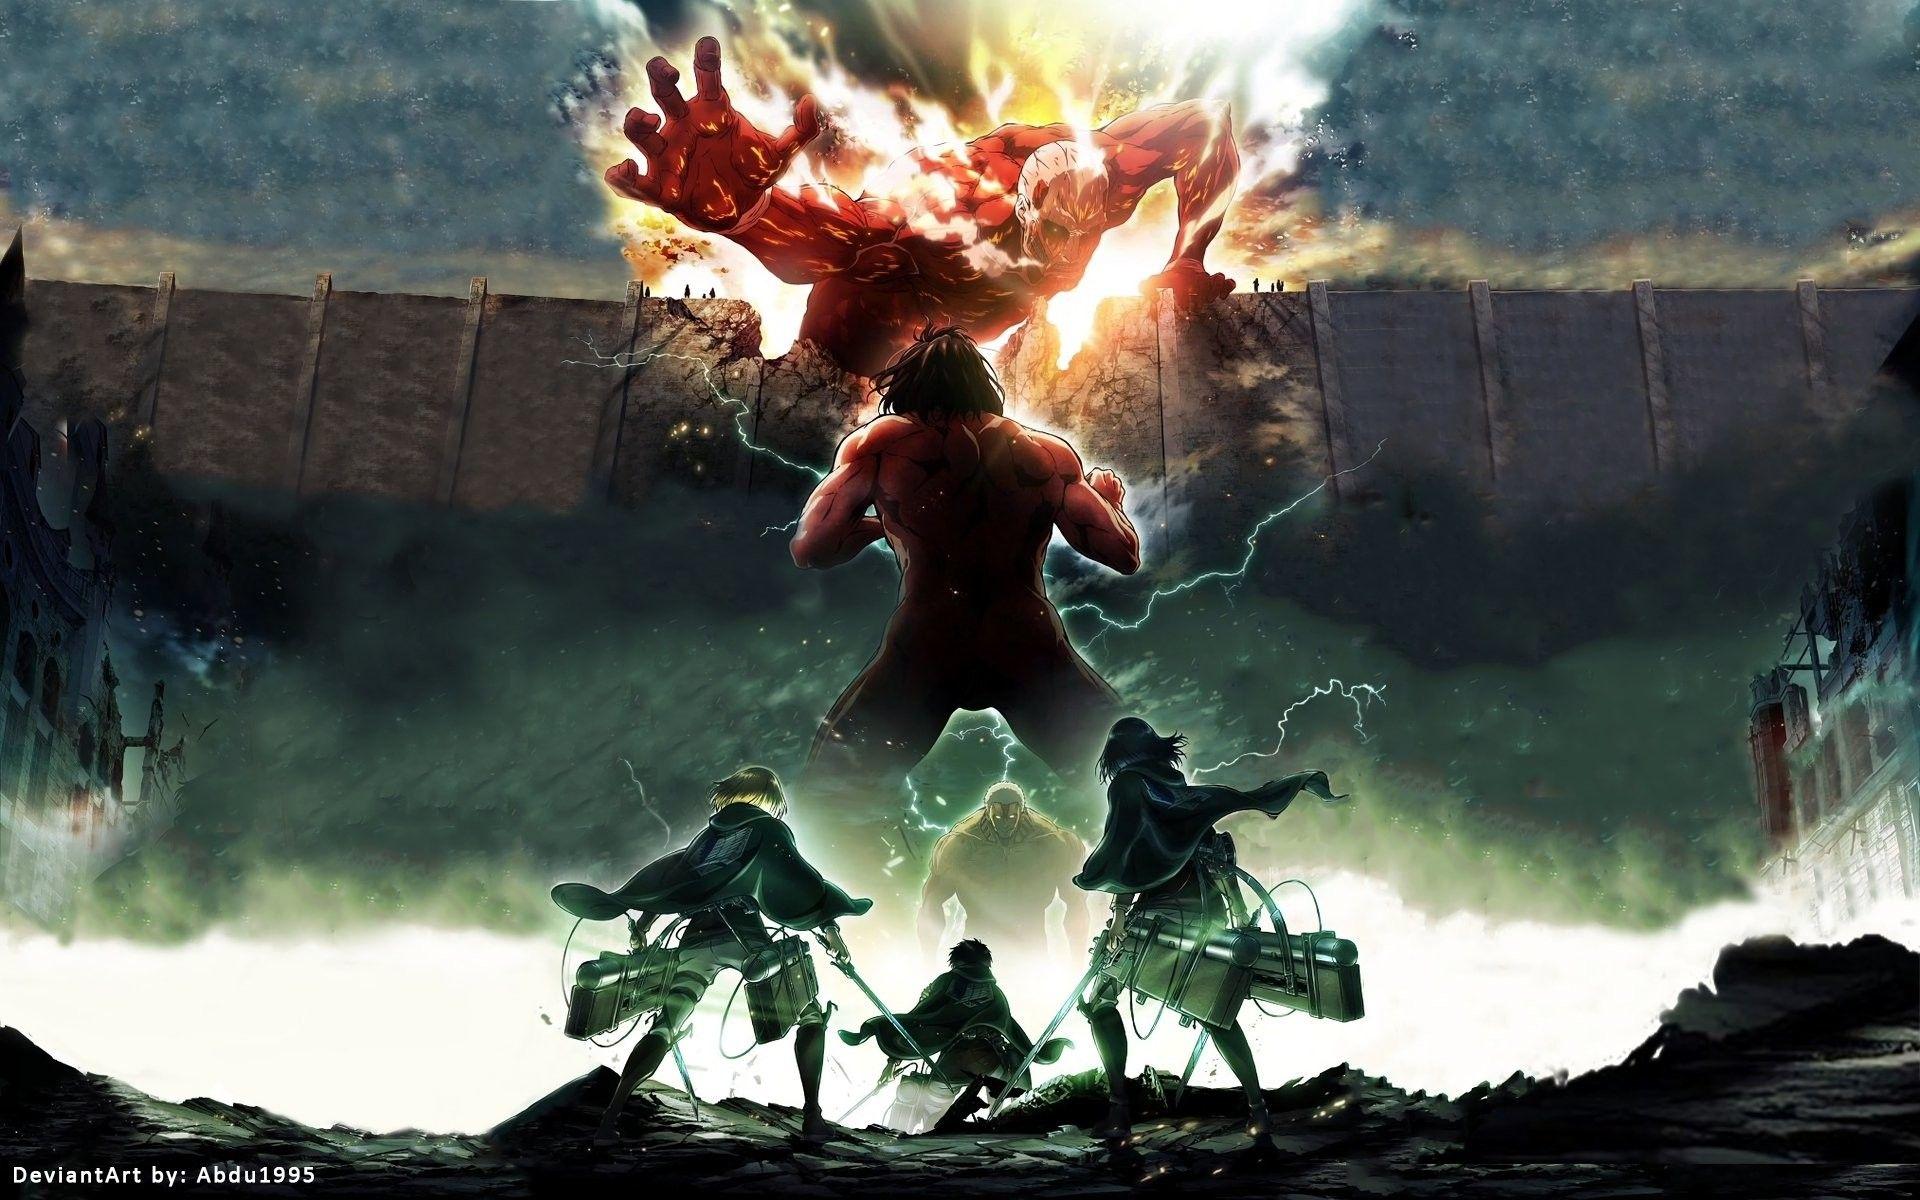 Attack On Titan Wallpaper Hd 64 Images Titans Anime Attack On Titan Attack On Titan Anime